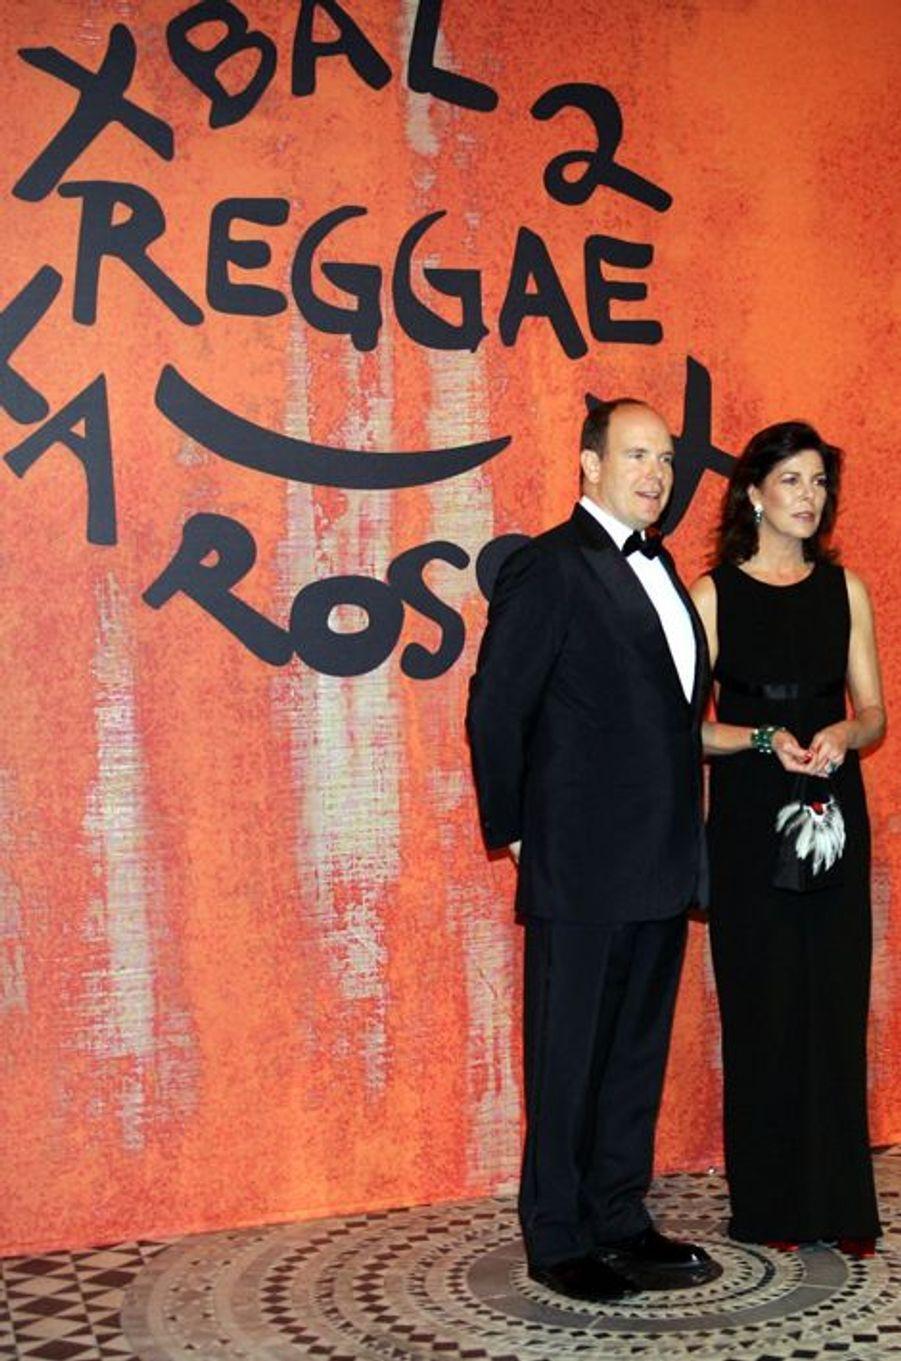 La princesse Caroline de Monaco au bal de la Rose 2006, avec le prince Albert II